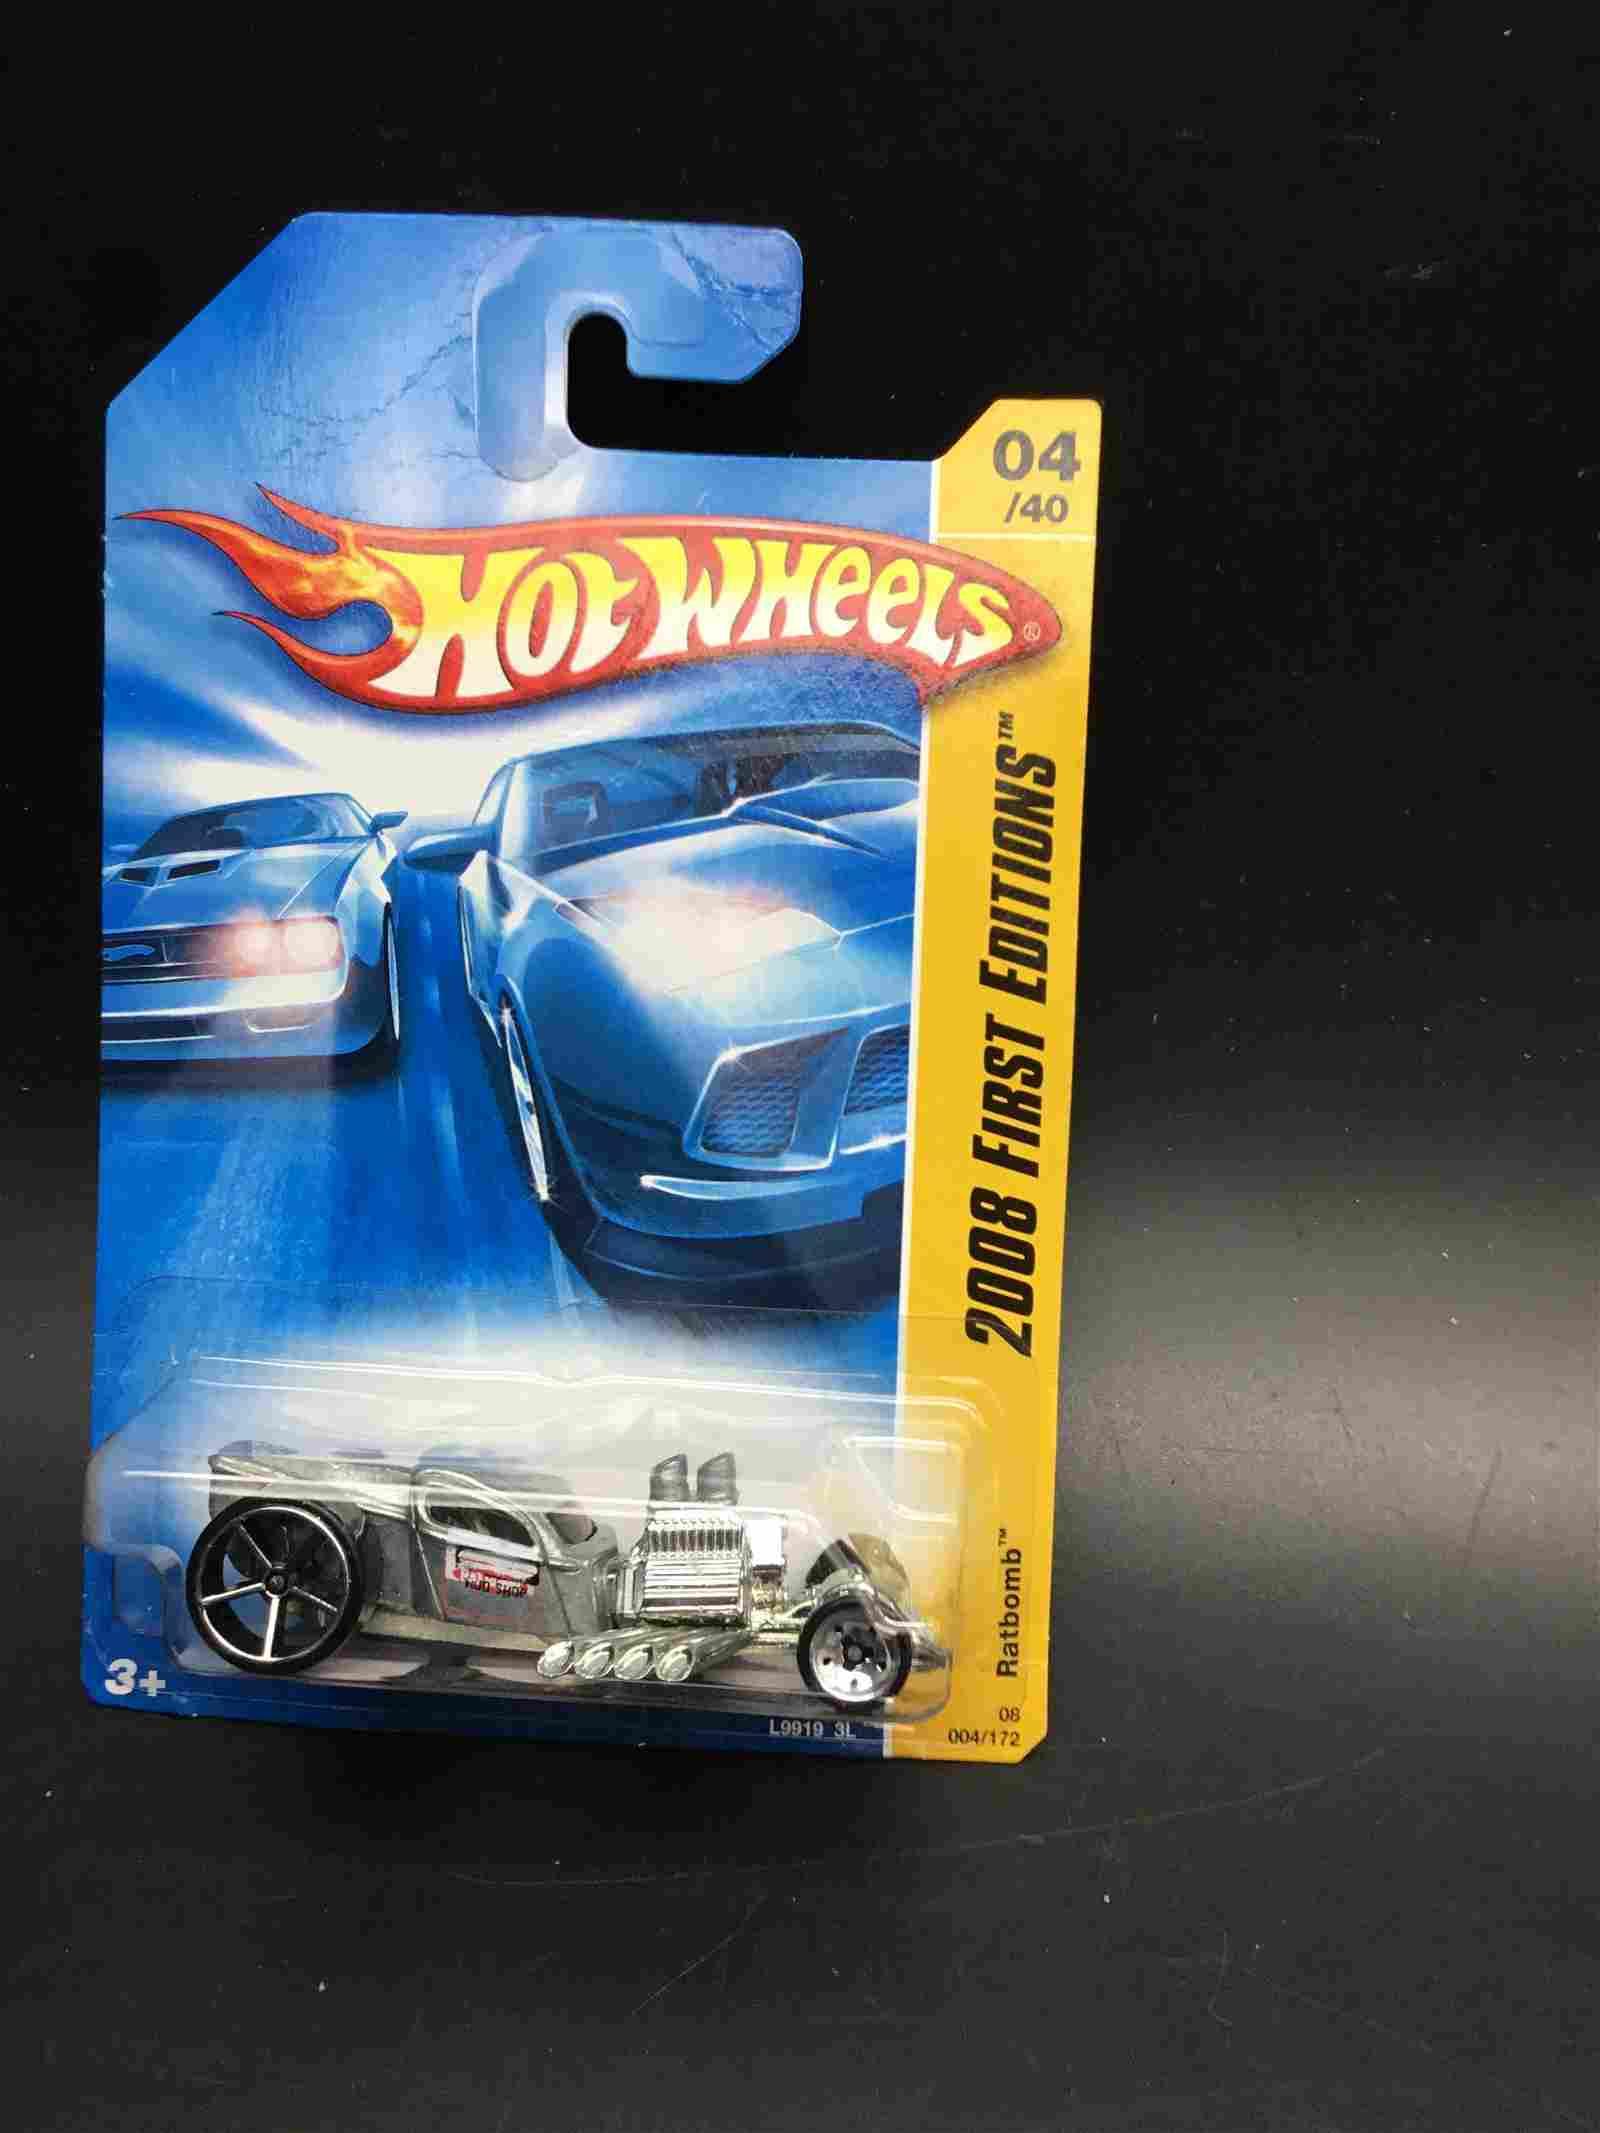 #004 is a 2008 Hot Wheel Rat Bombs